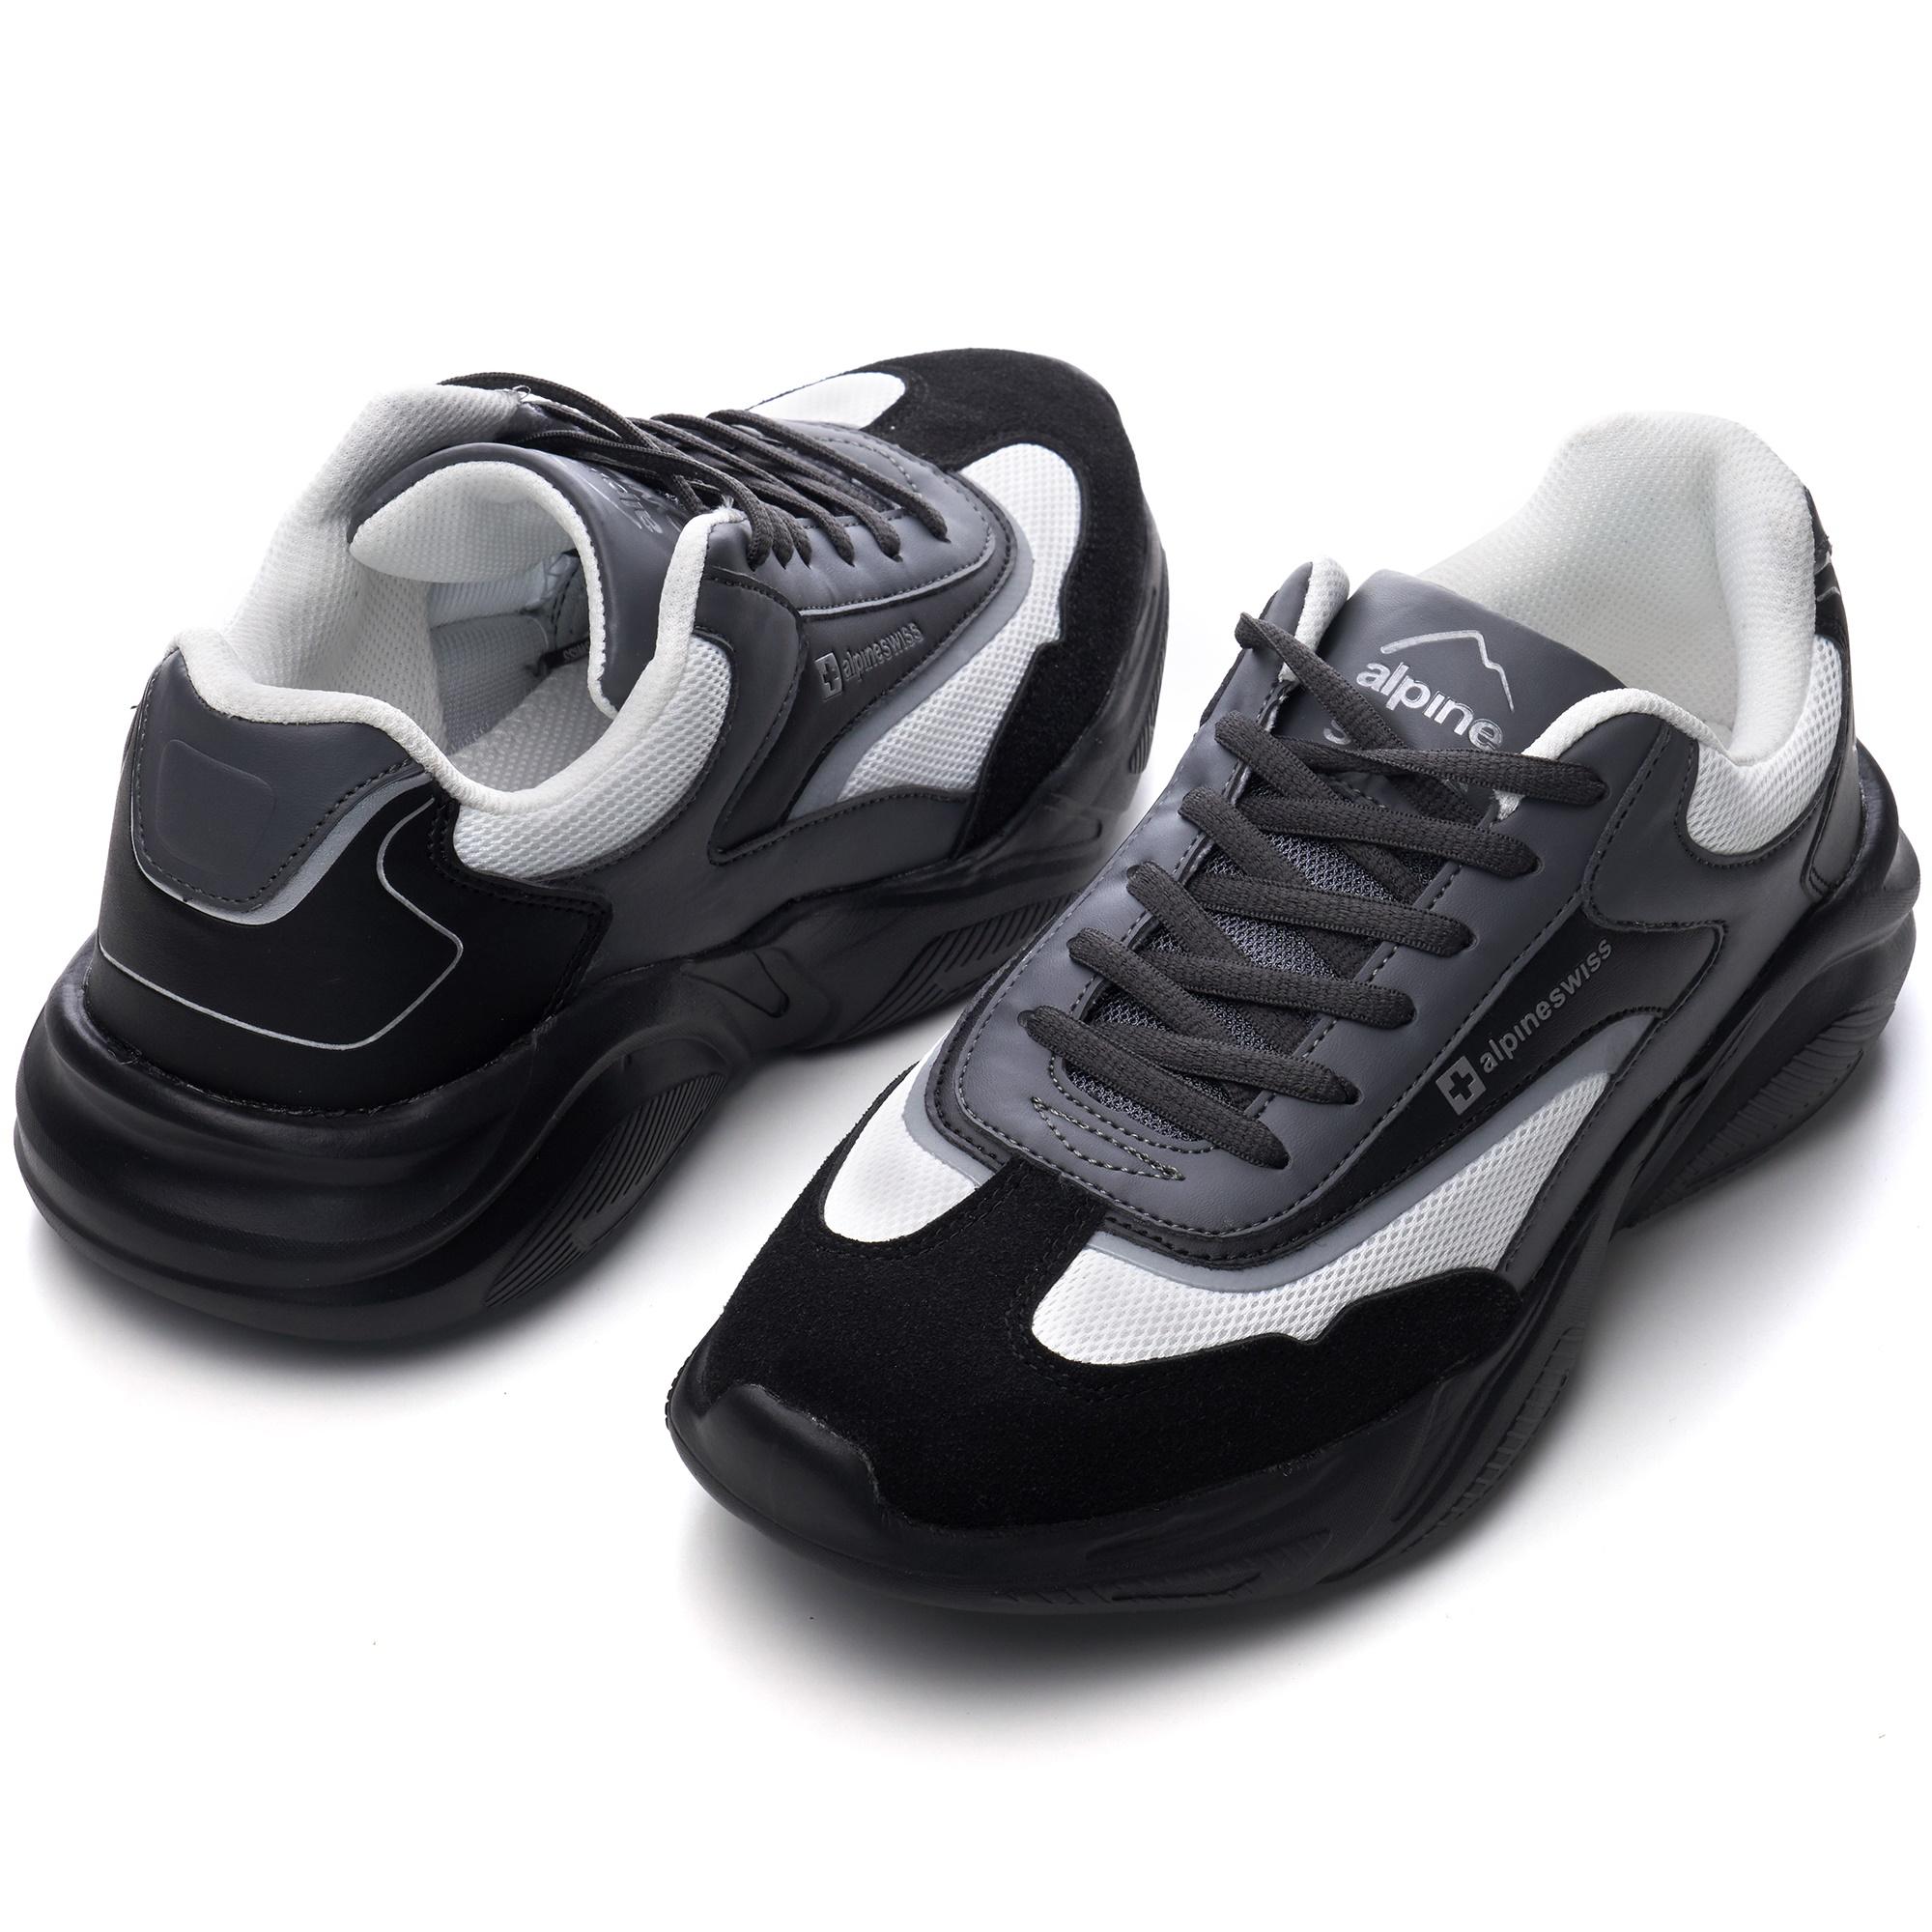 Alpine-Swiss-Stuart-Mens-Chunky-Sneakers-Retro-Platform-Dad-Tennis-Shoes thumbnail 21